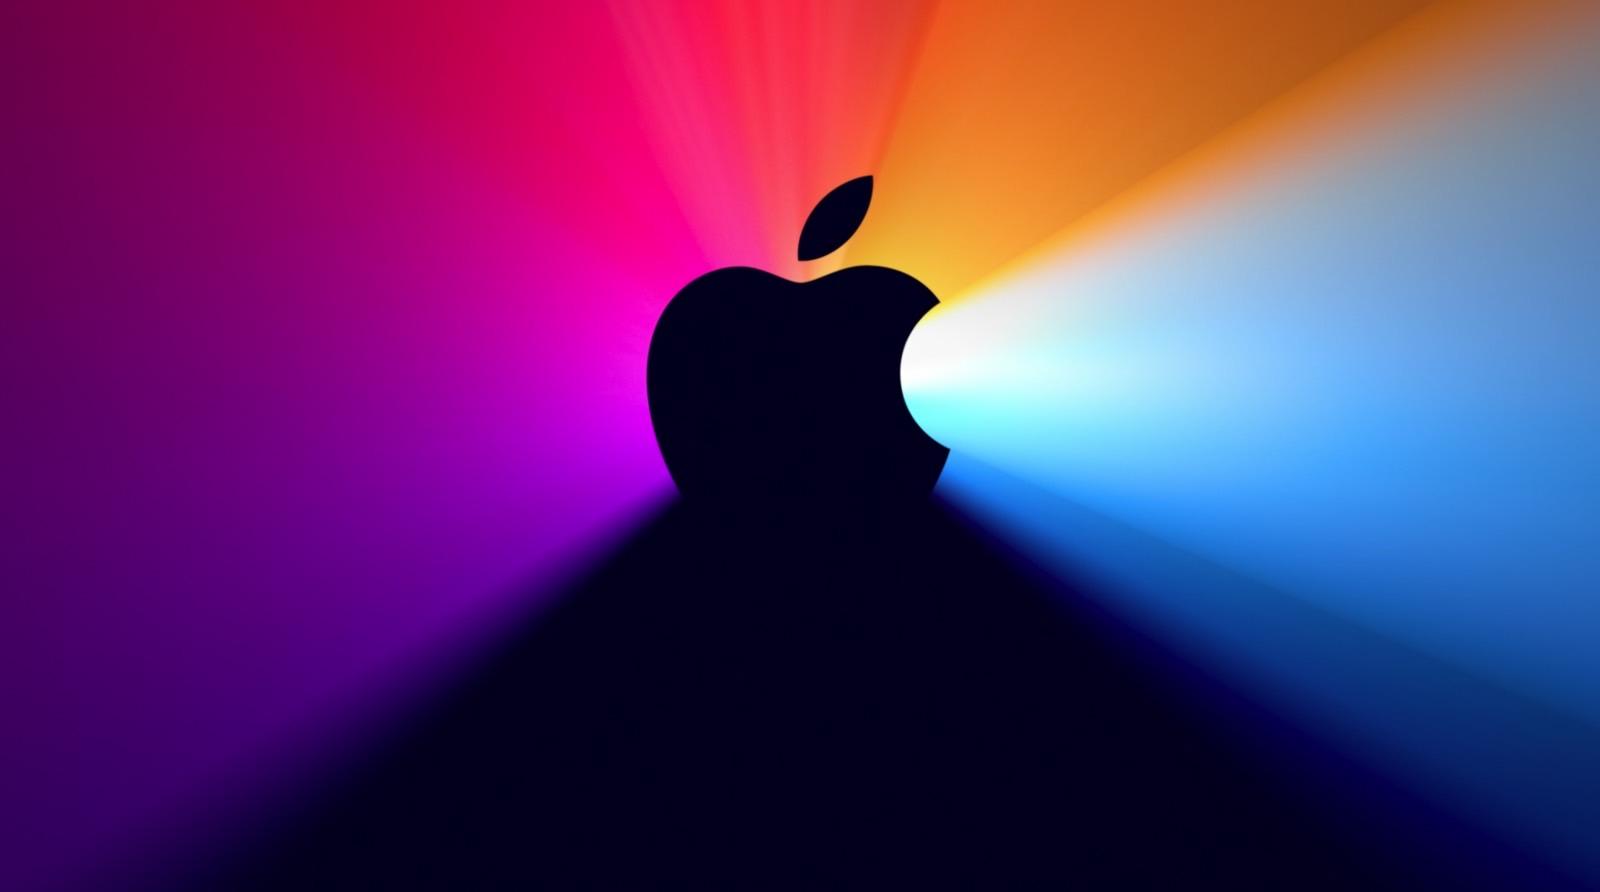 Apple membukukan pendapatan Q3 dan memberikan kuartal monster dengan pendapatan ,43 miliar